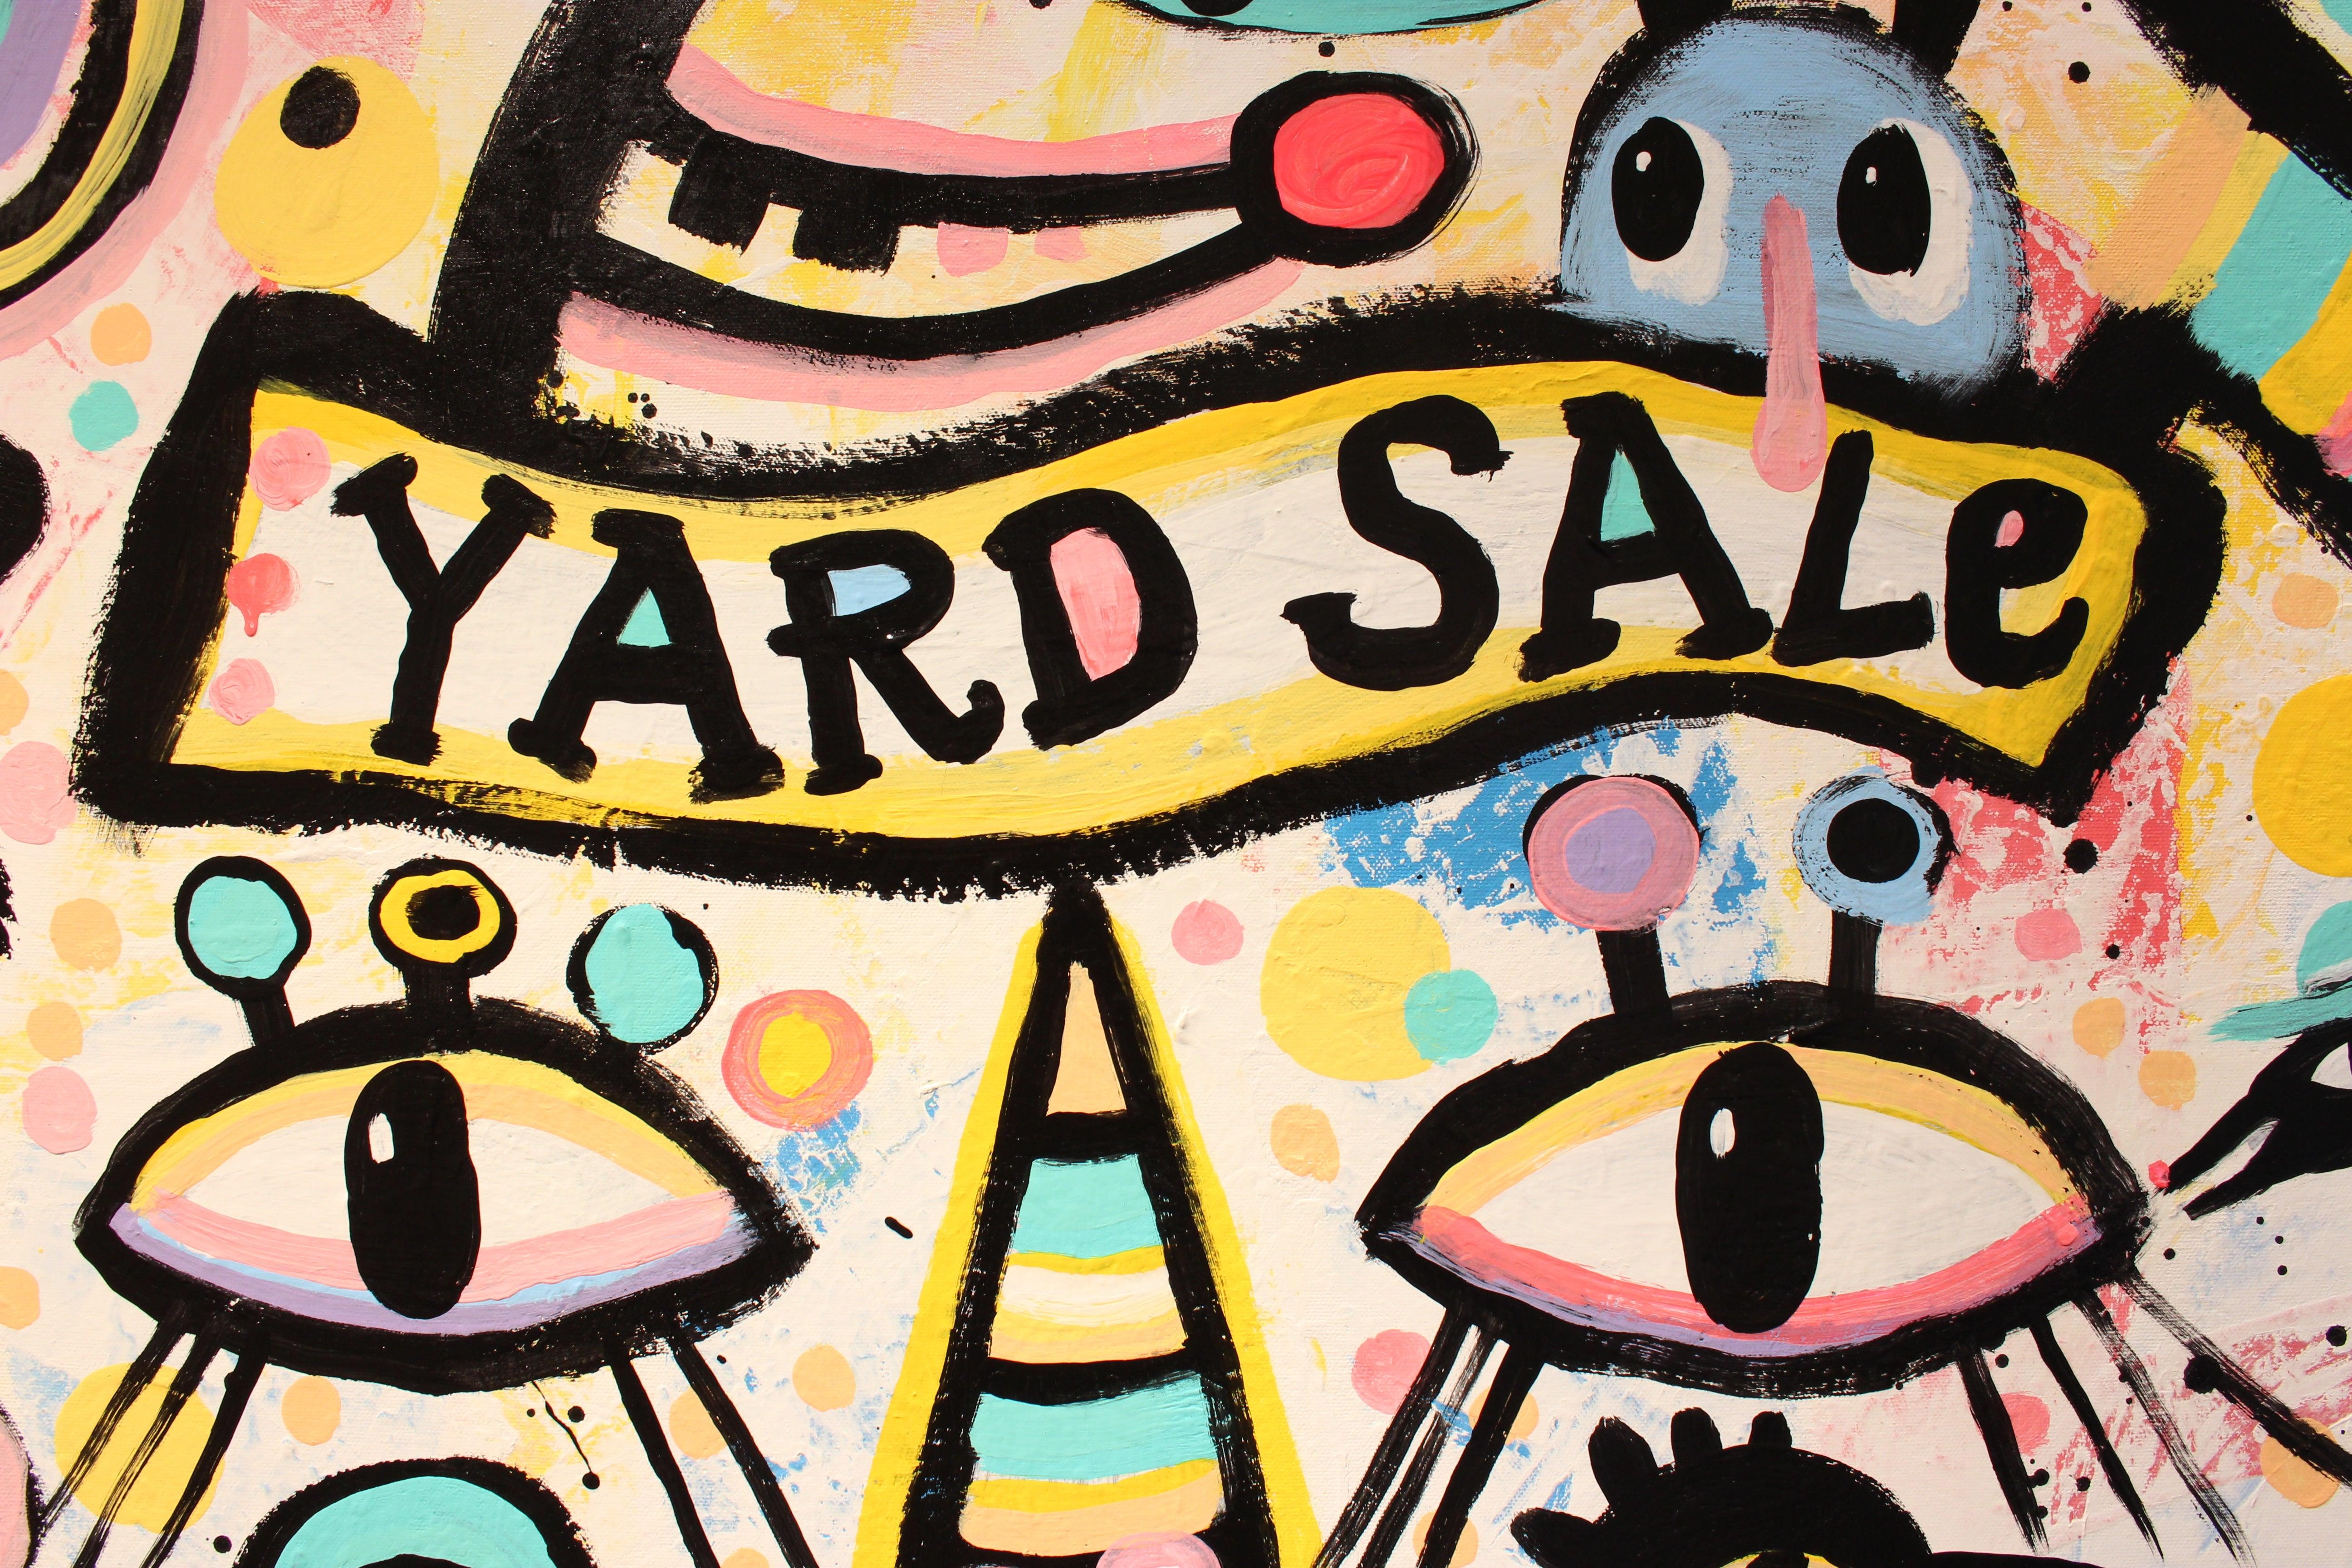 Kyle Brooks - Yard Sale, Painting For Sale at 1stdibs